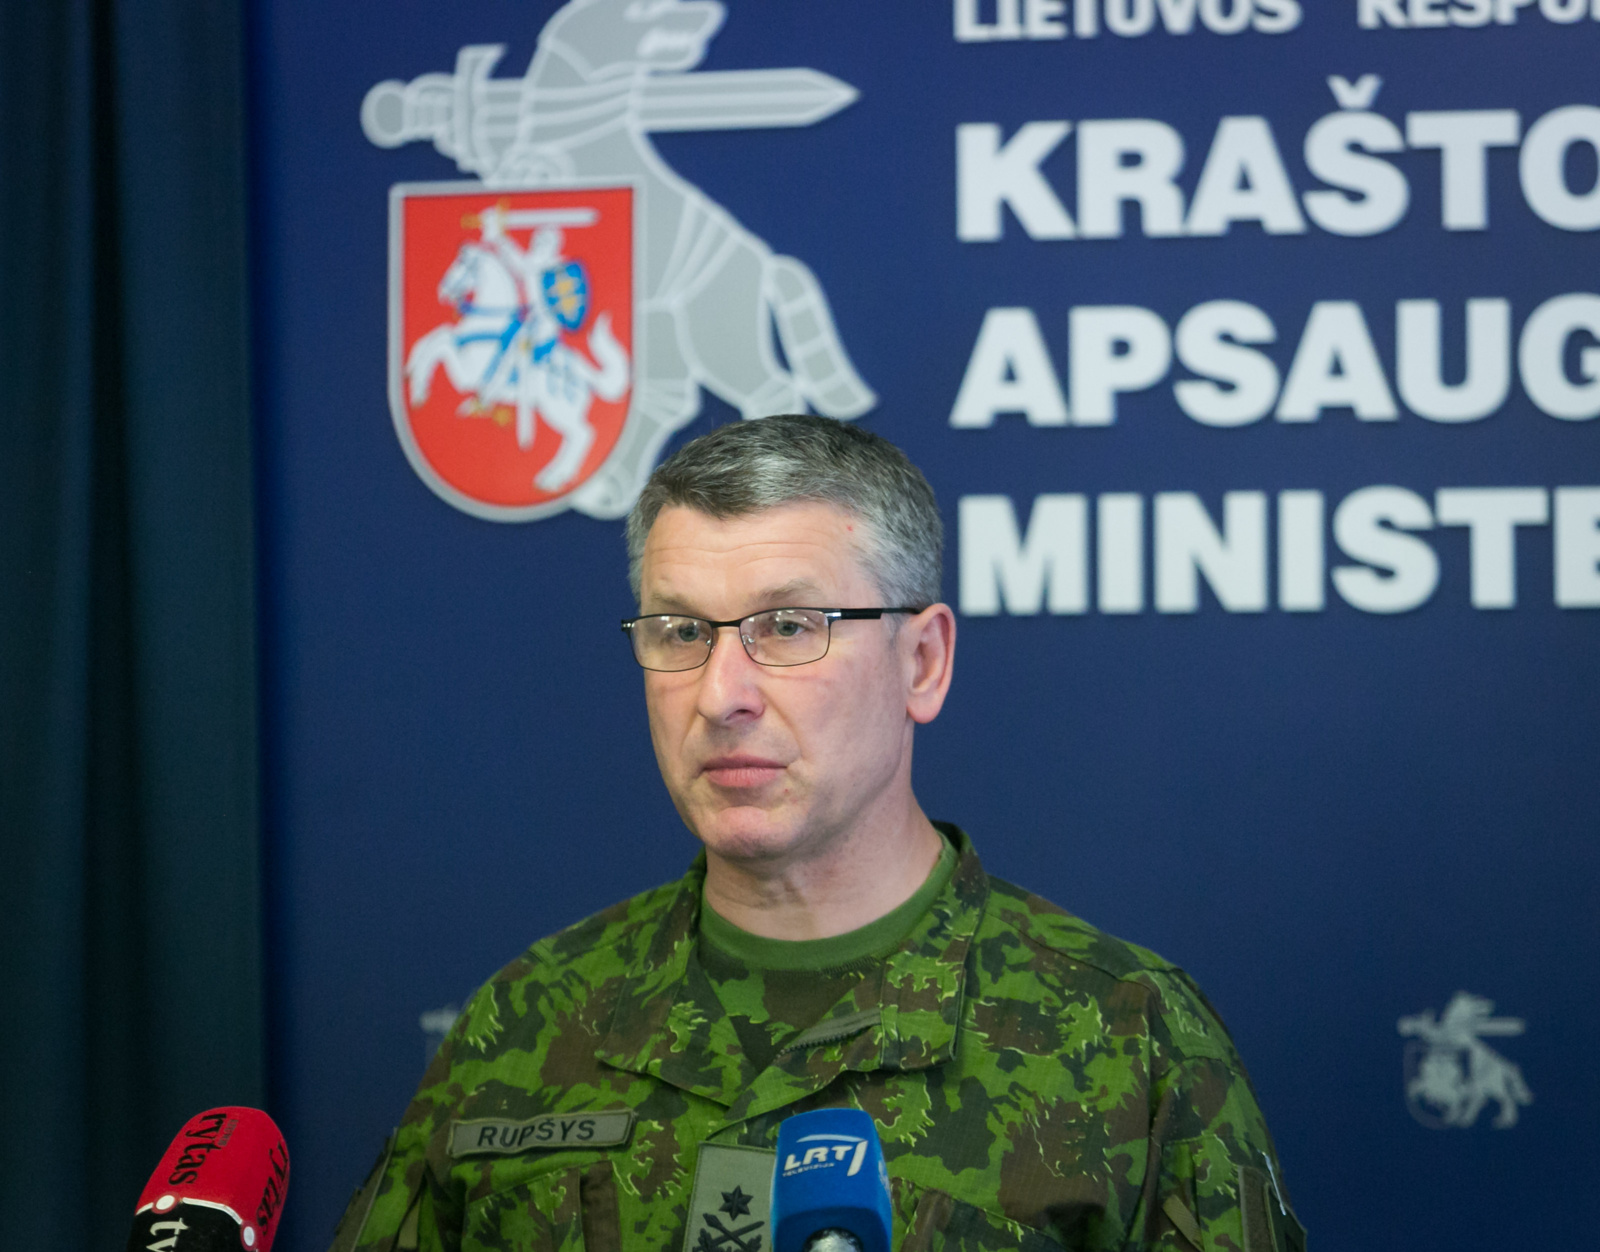 V. Rupšys paskirtas Lietuvos kariuomenės vadu